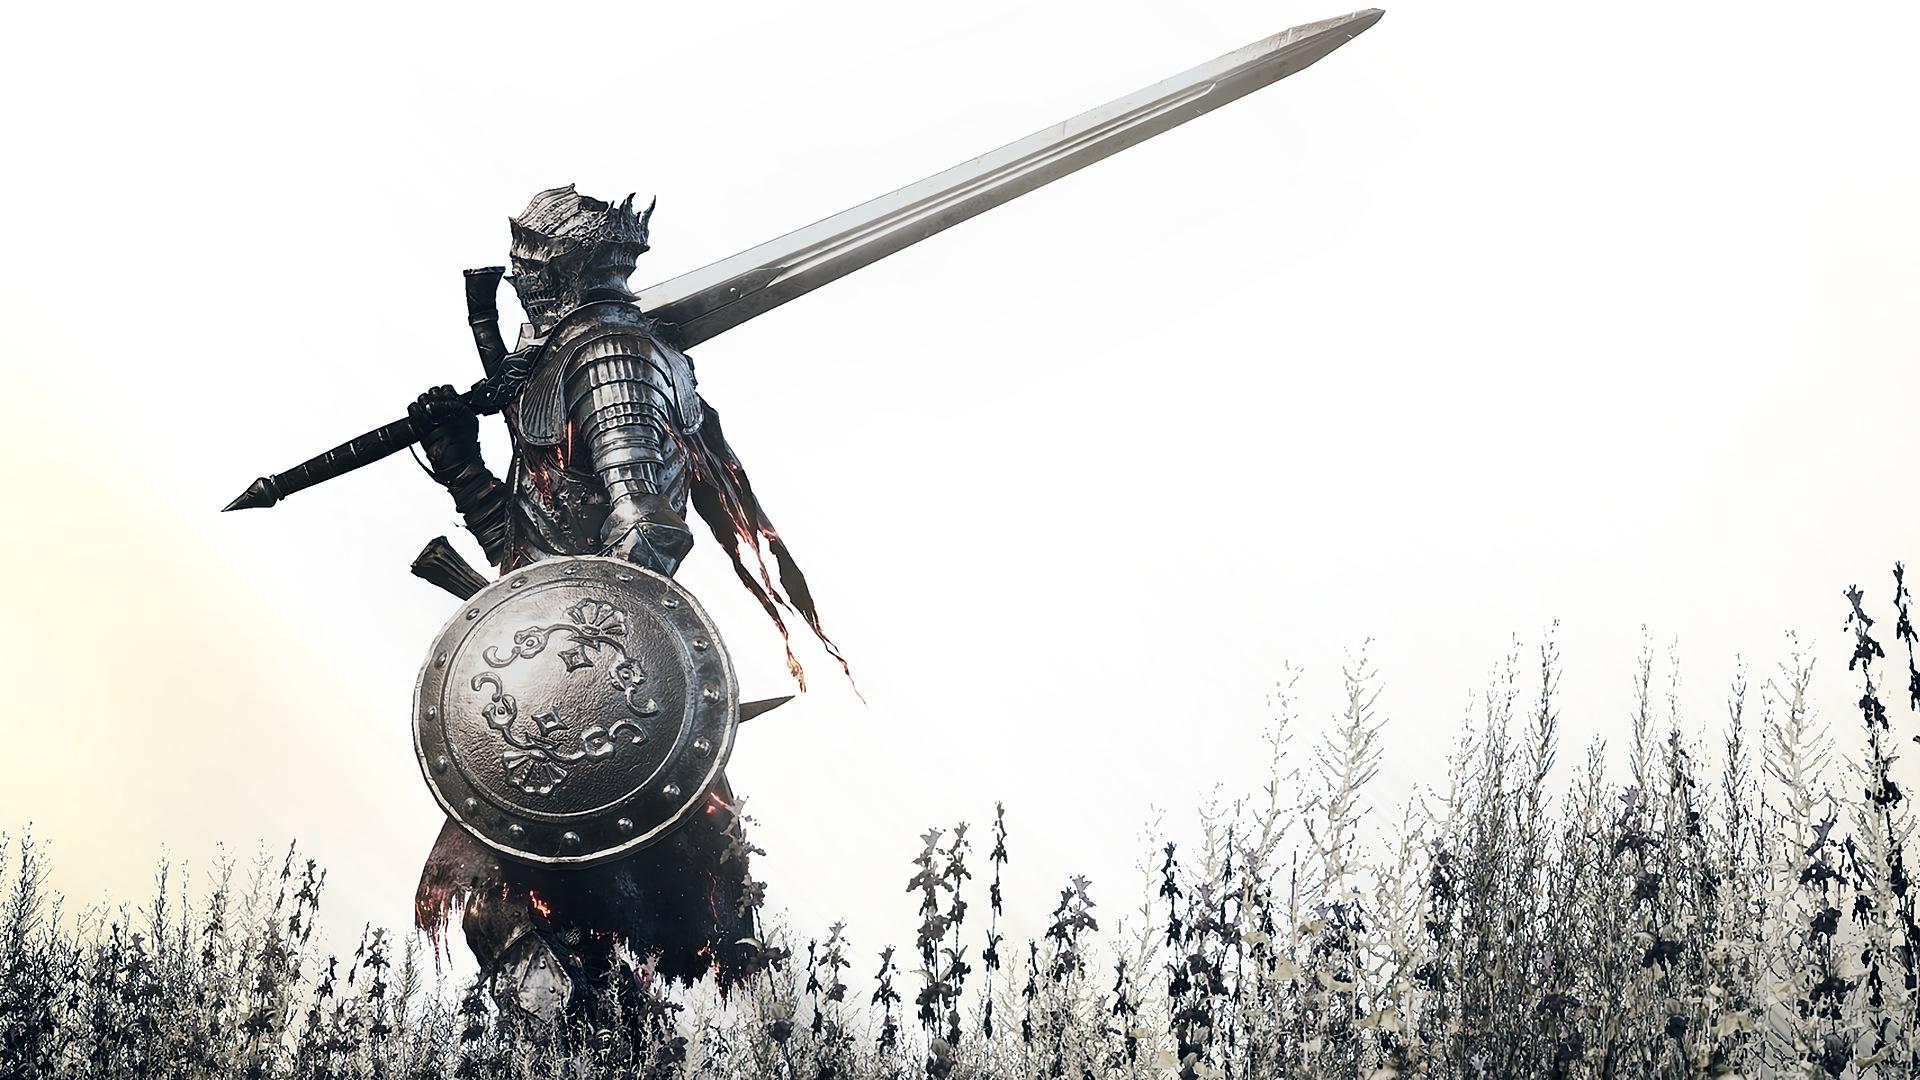 Картинки на рабочий стол воин с мечом